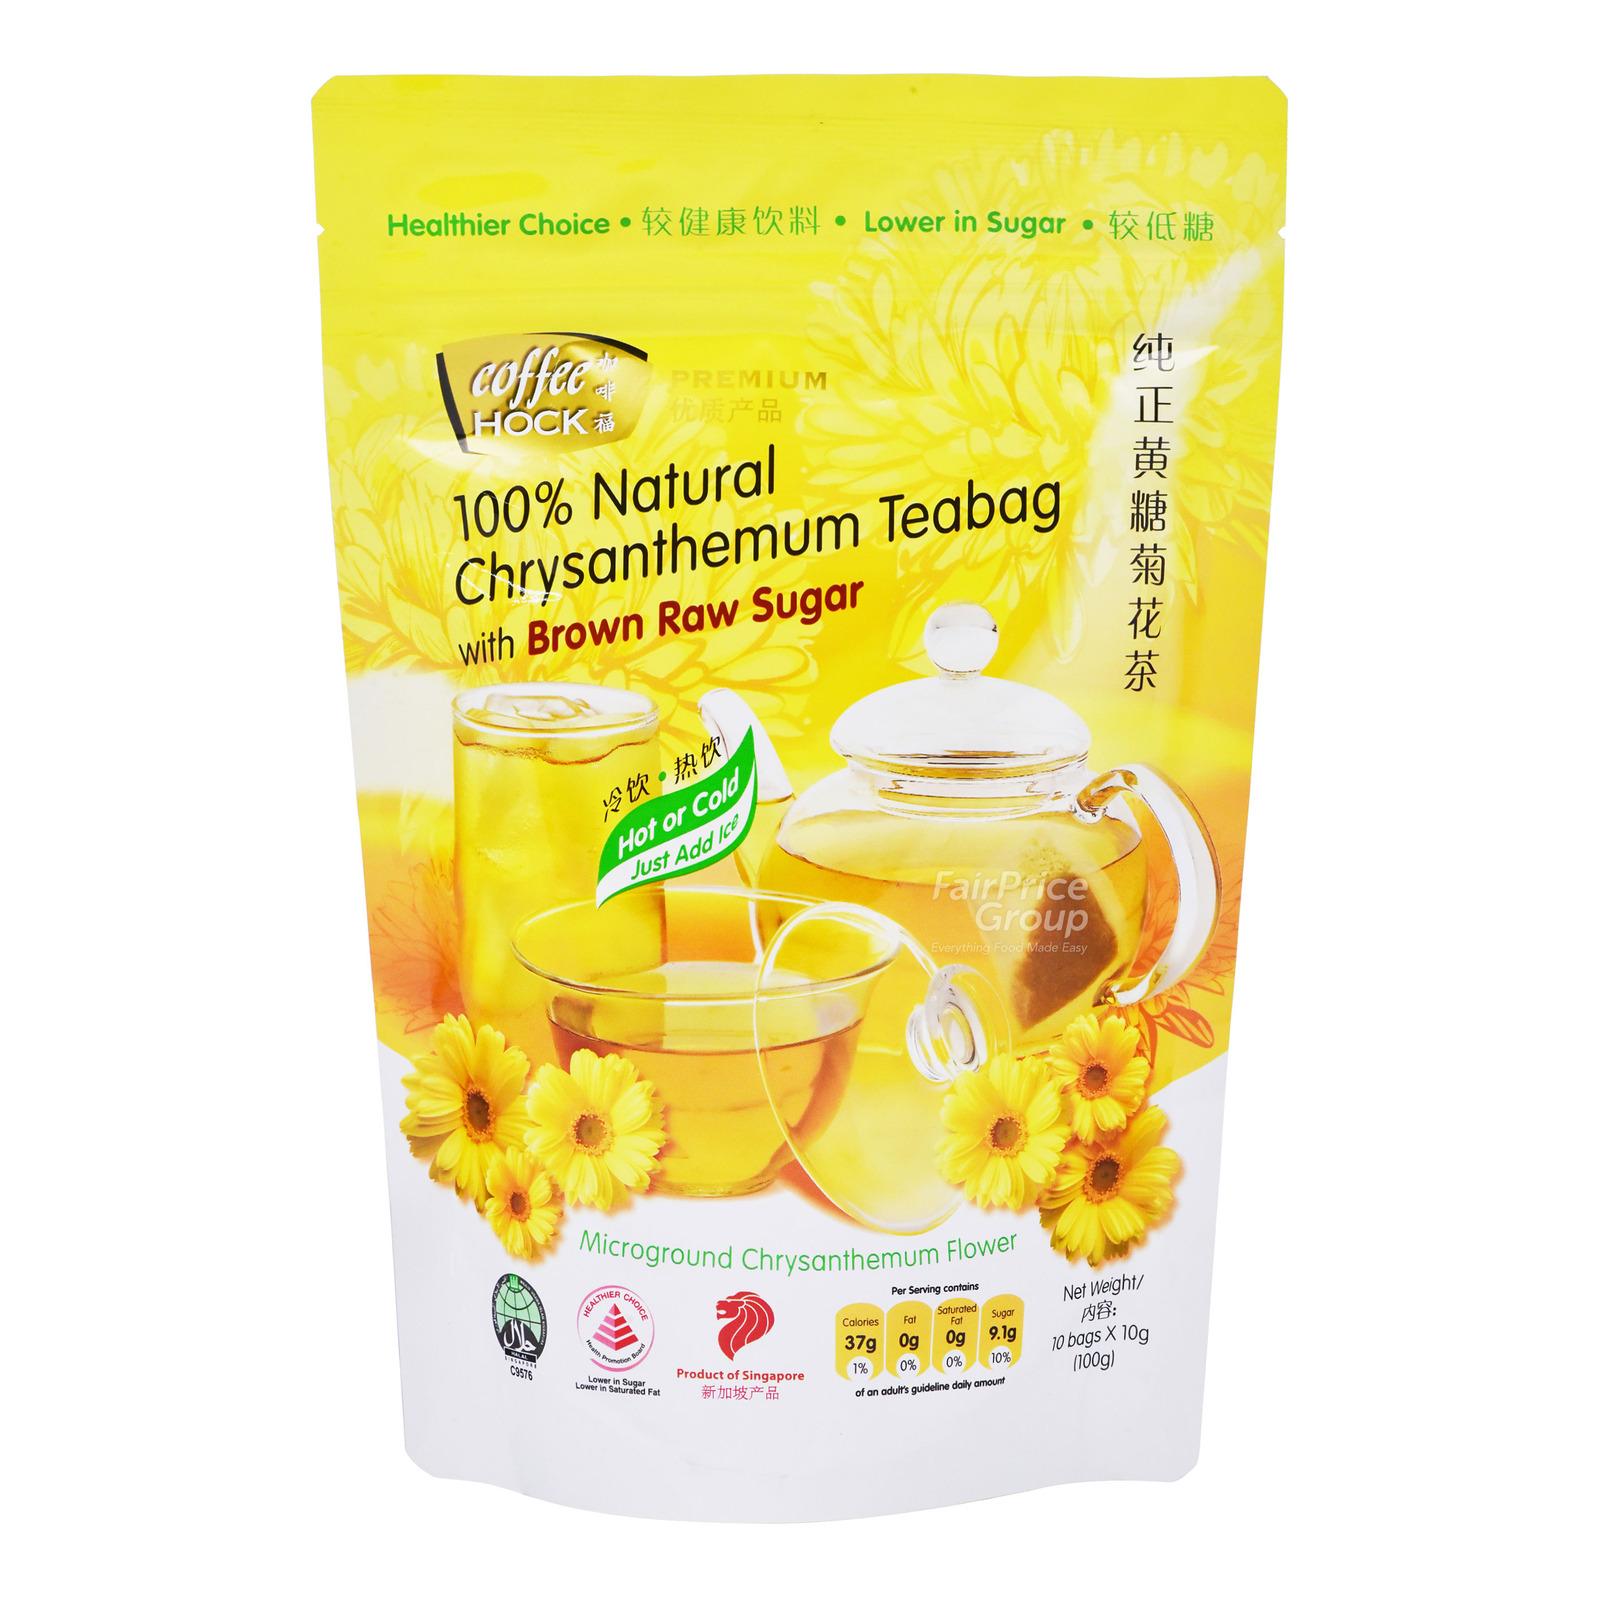 Coffee Hock 100% Natural Chrysanthemum Teabag - Brown Sugar